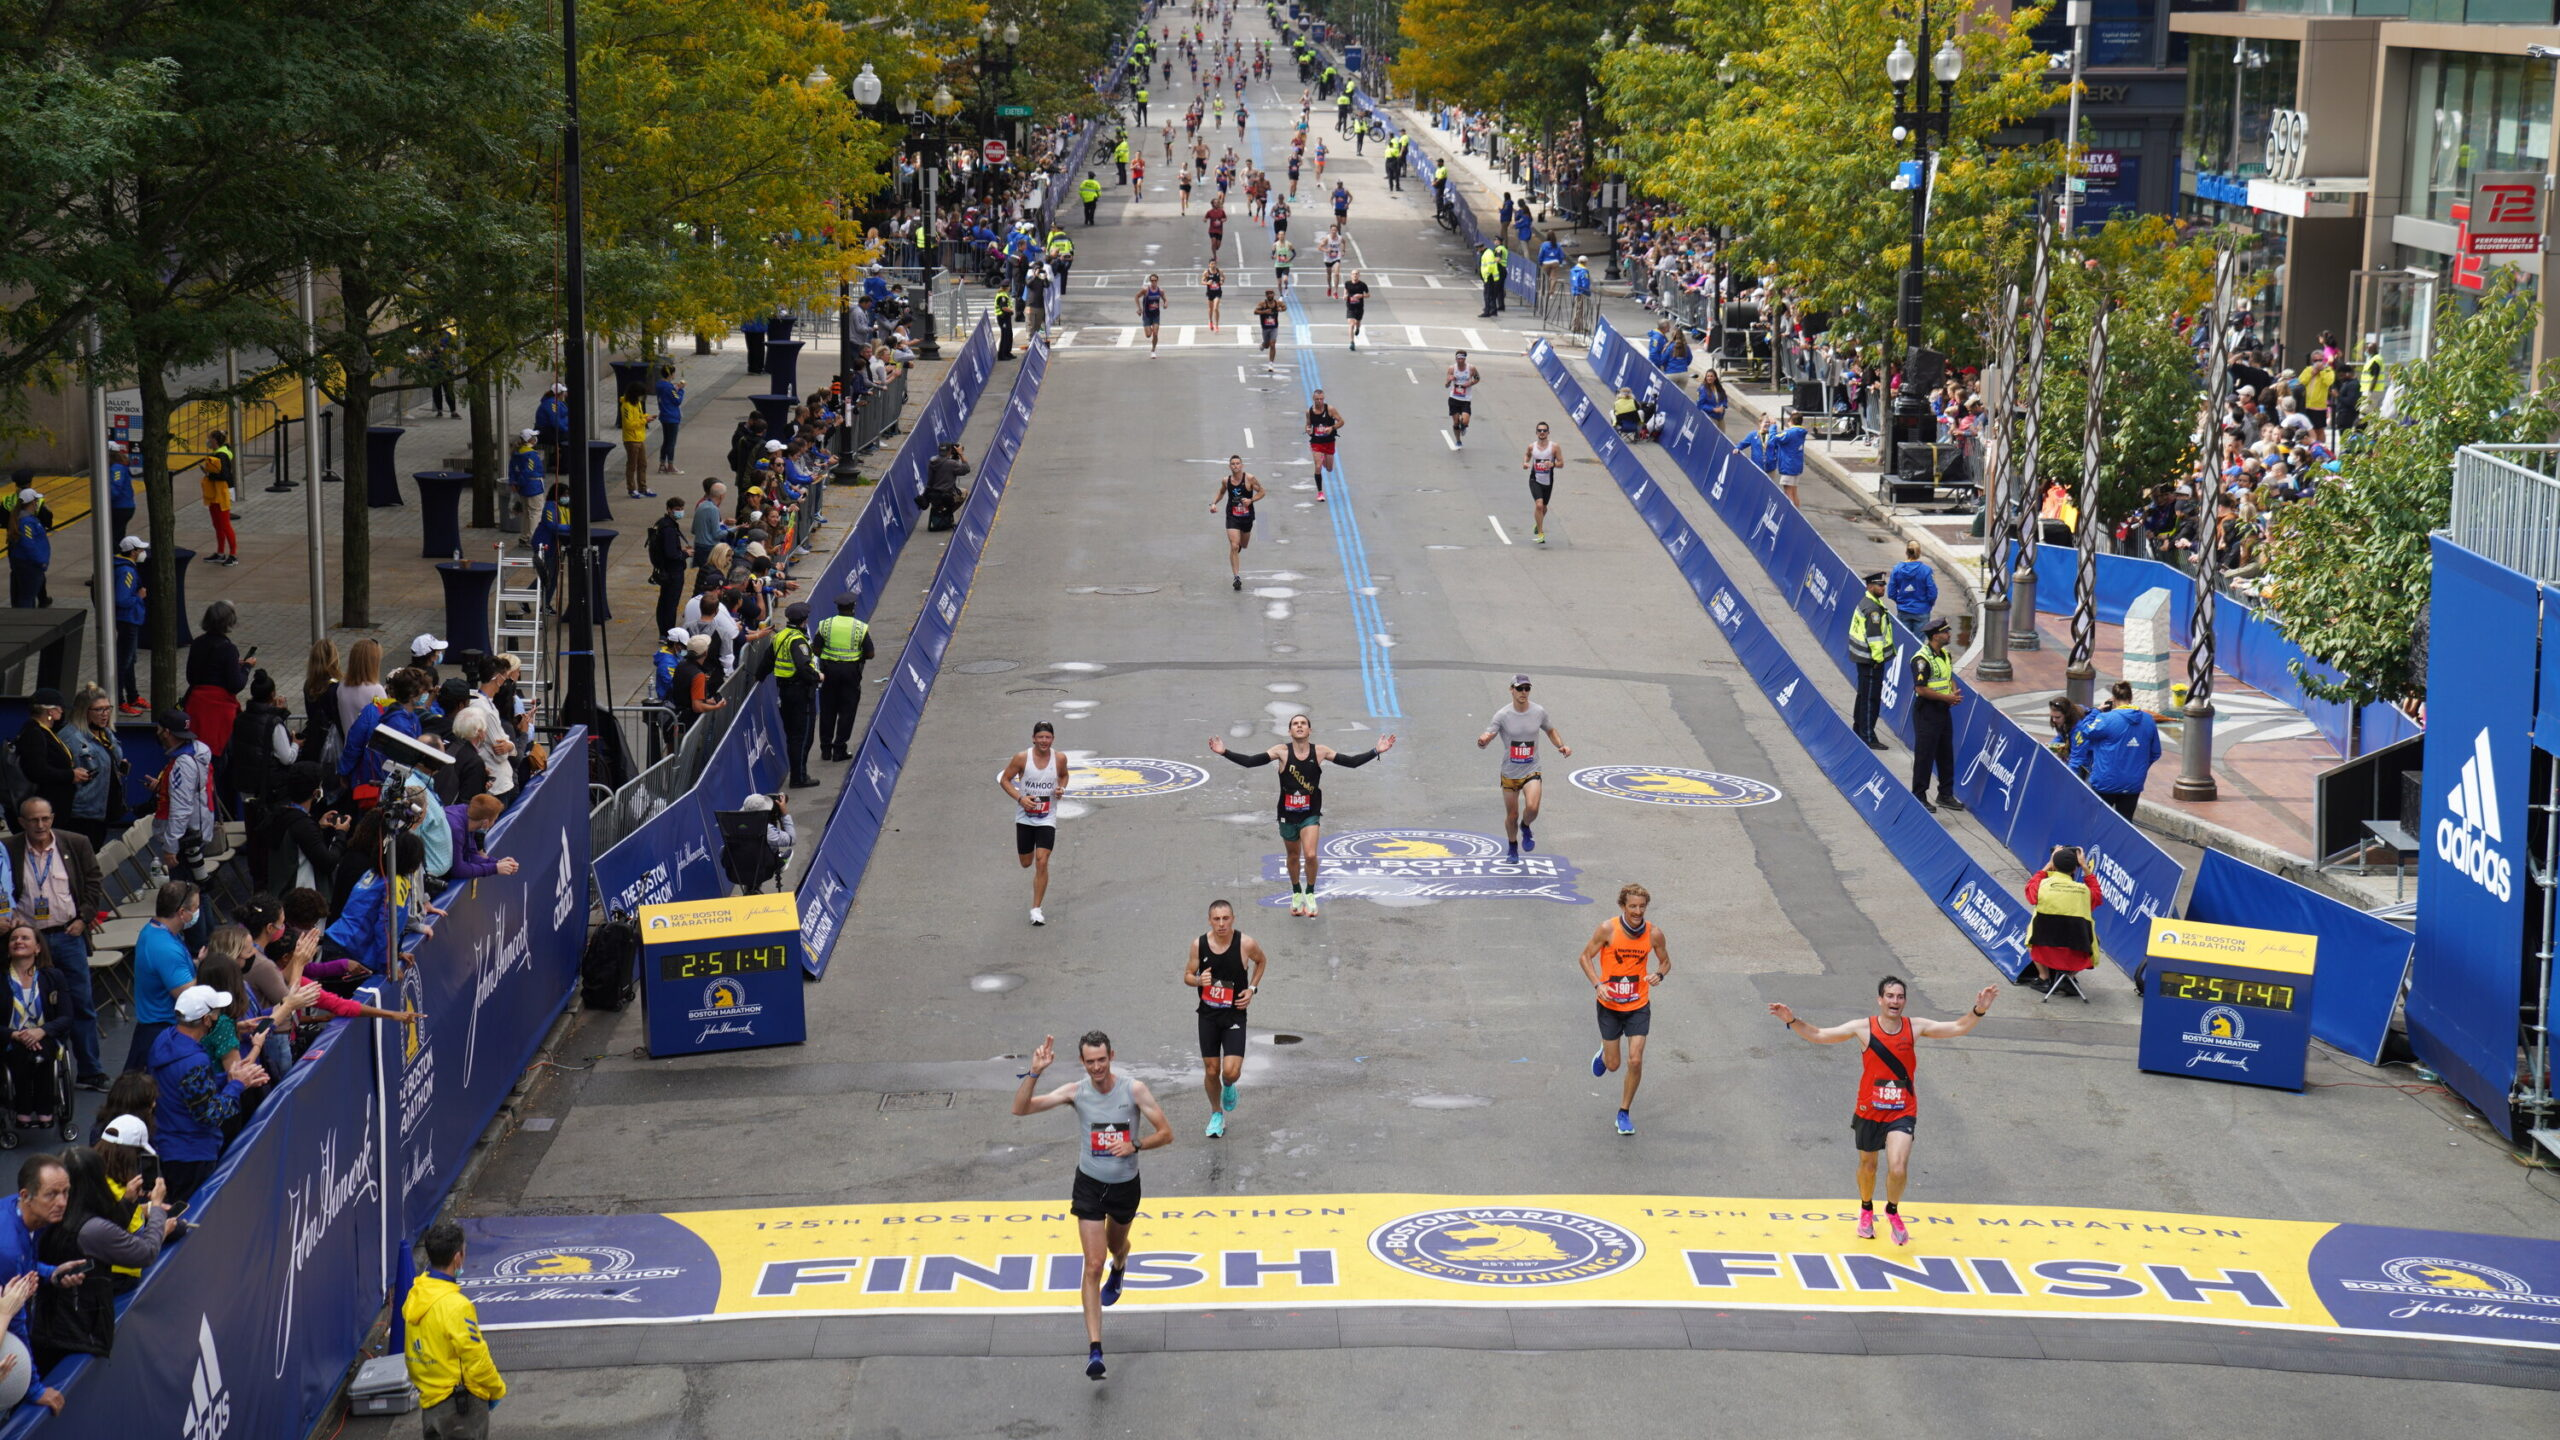 The Boston Marathon Returns, This Time as a Fall Classic 1